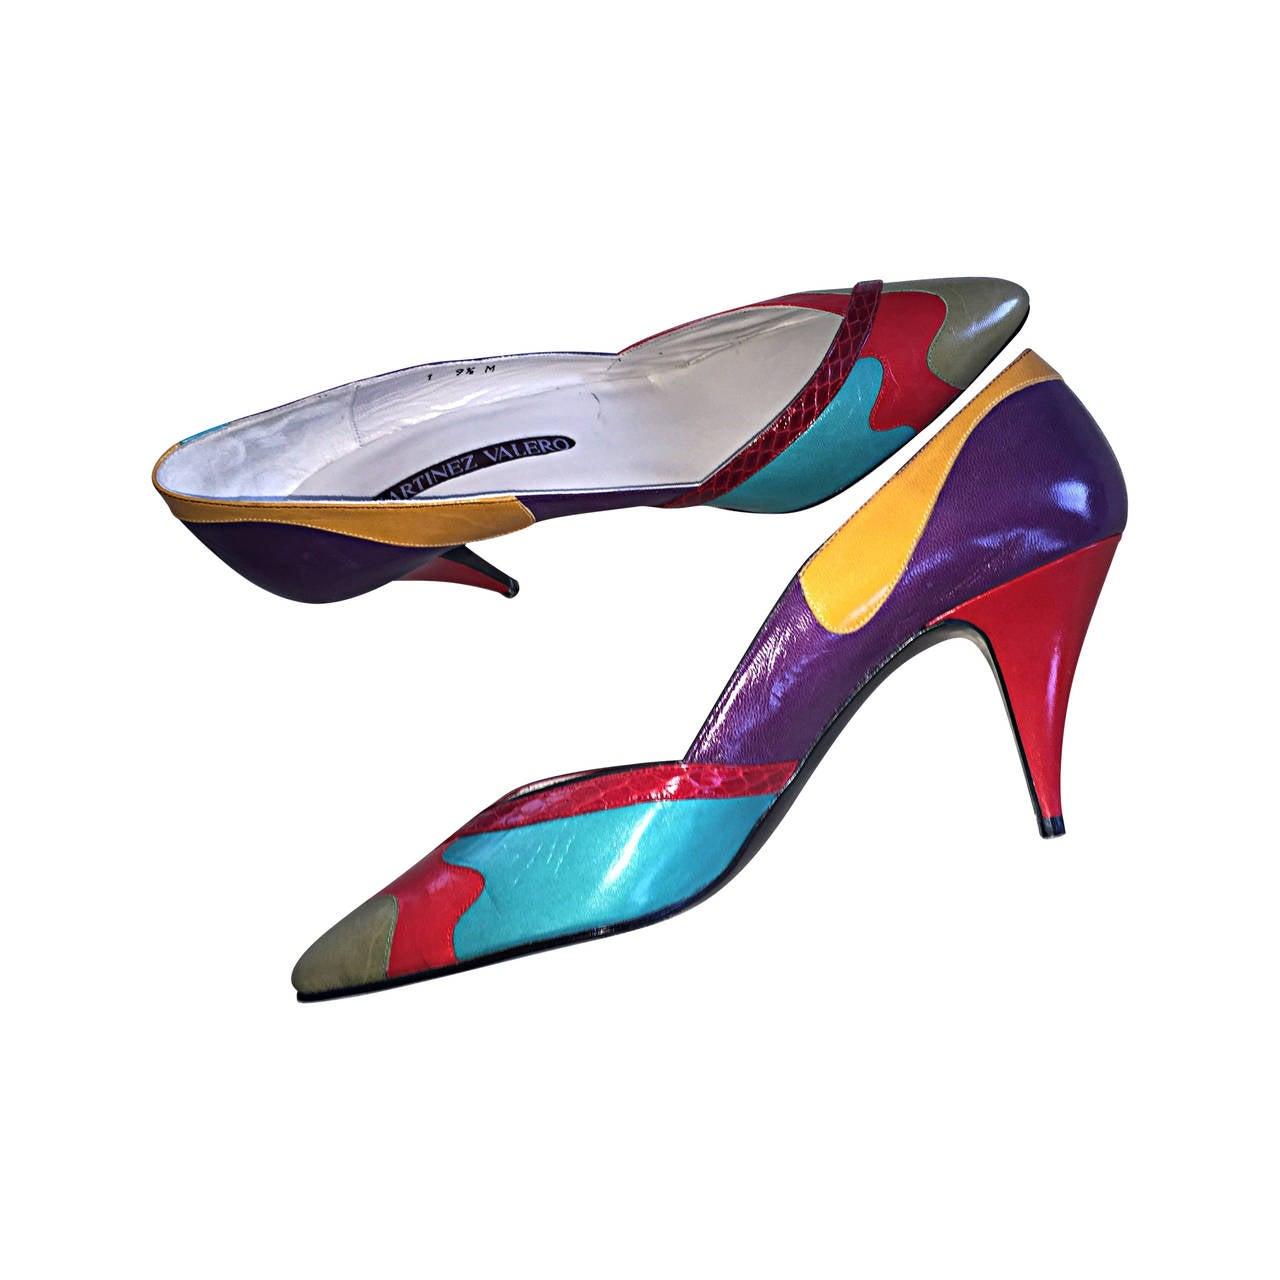 da5ea762e72be New 1980s Sz. 9.5 Color Block Leather / Snakeskin High Heels / Vintage Shoes